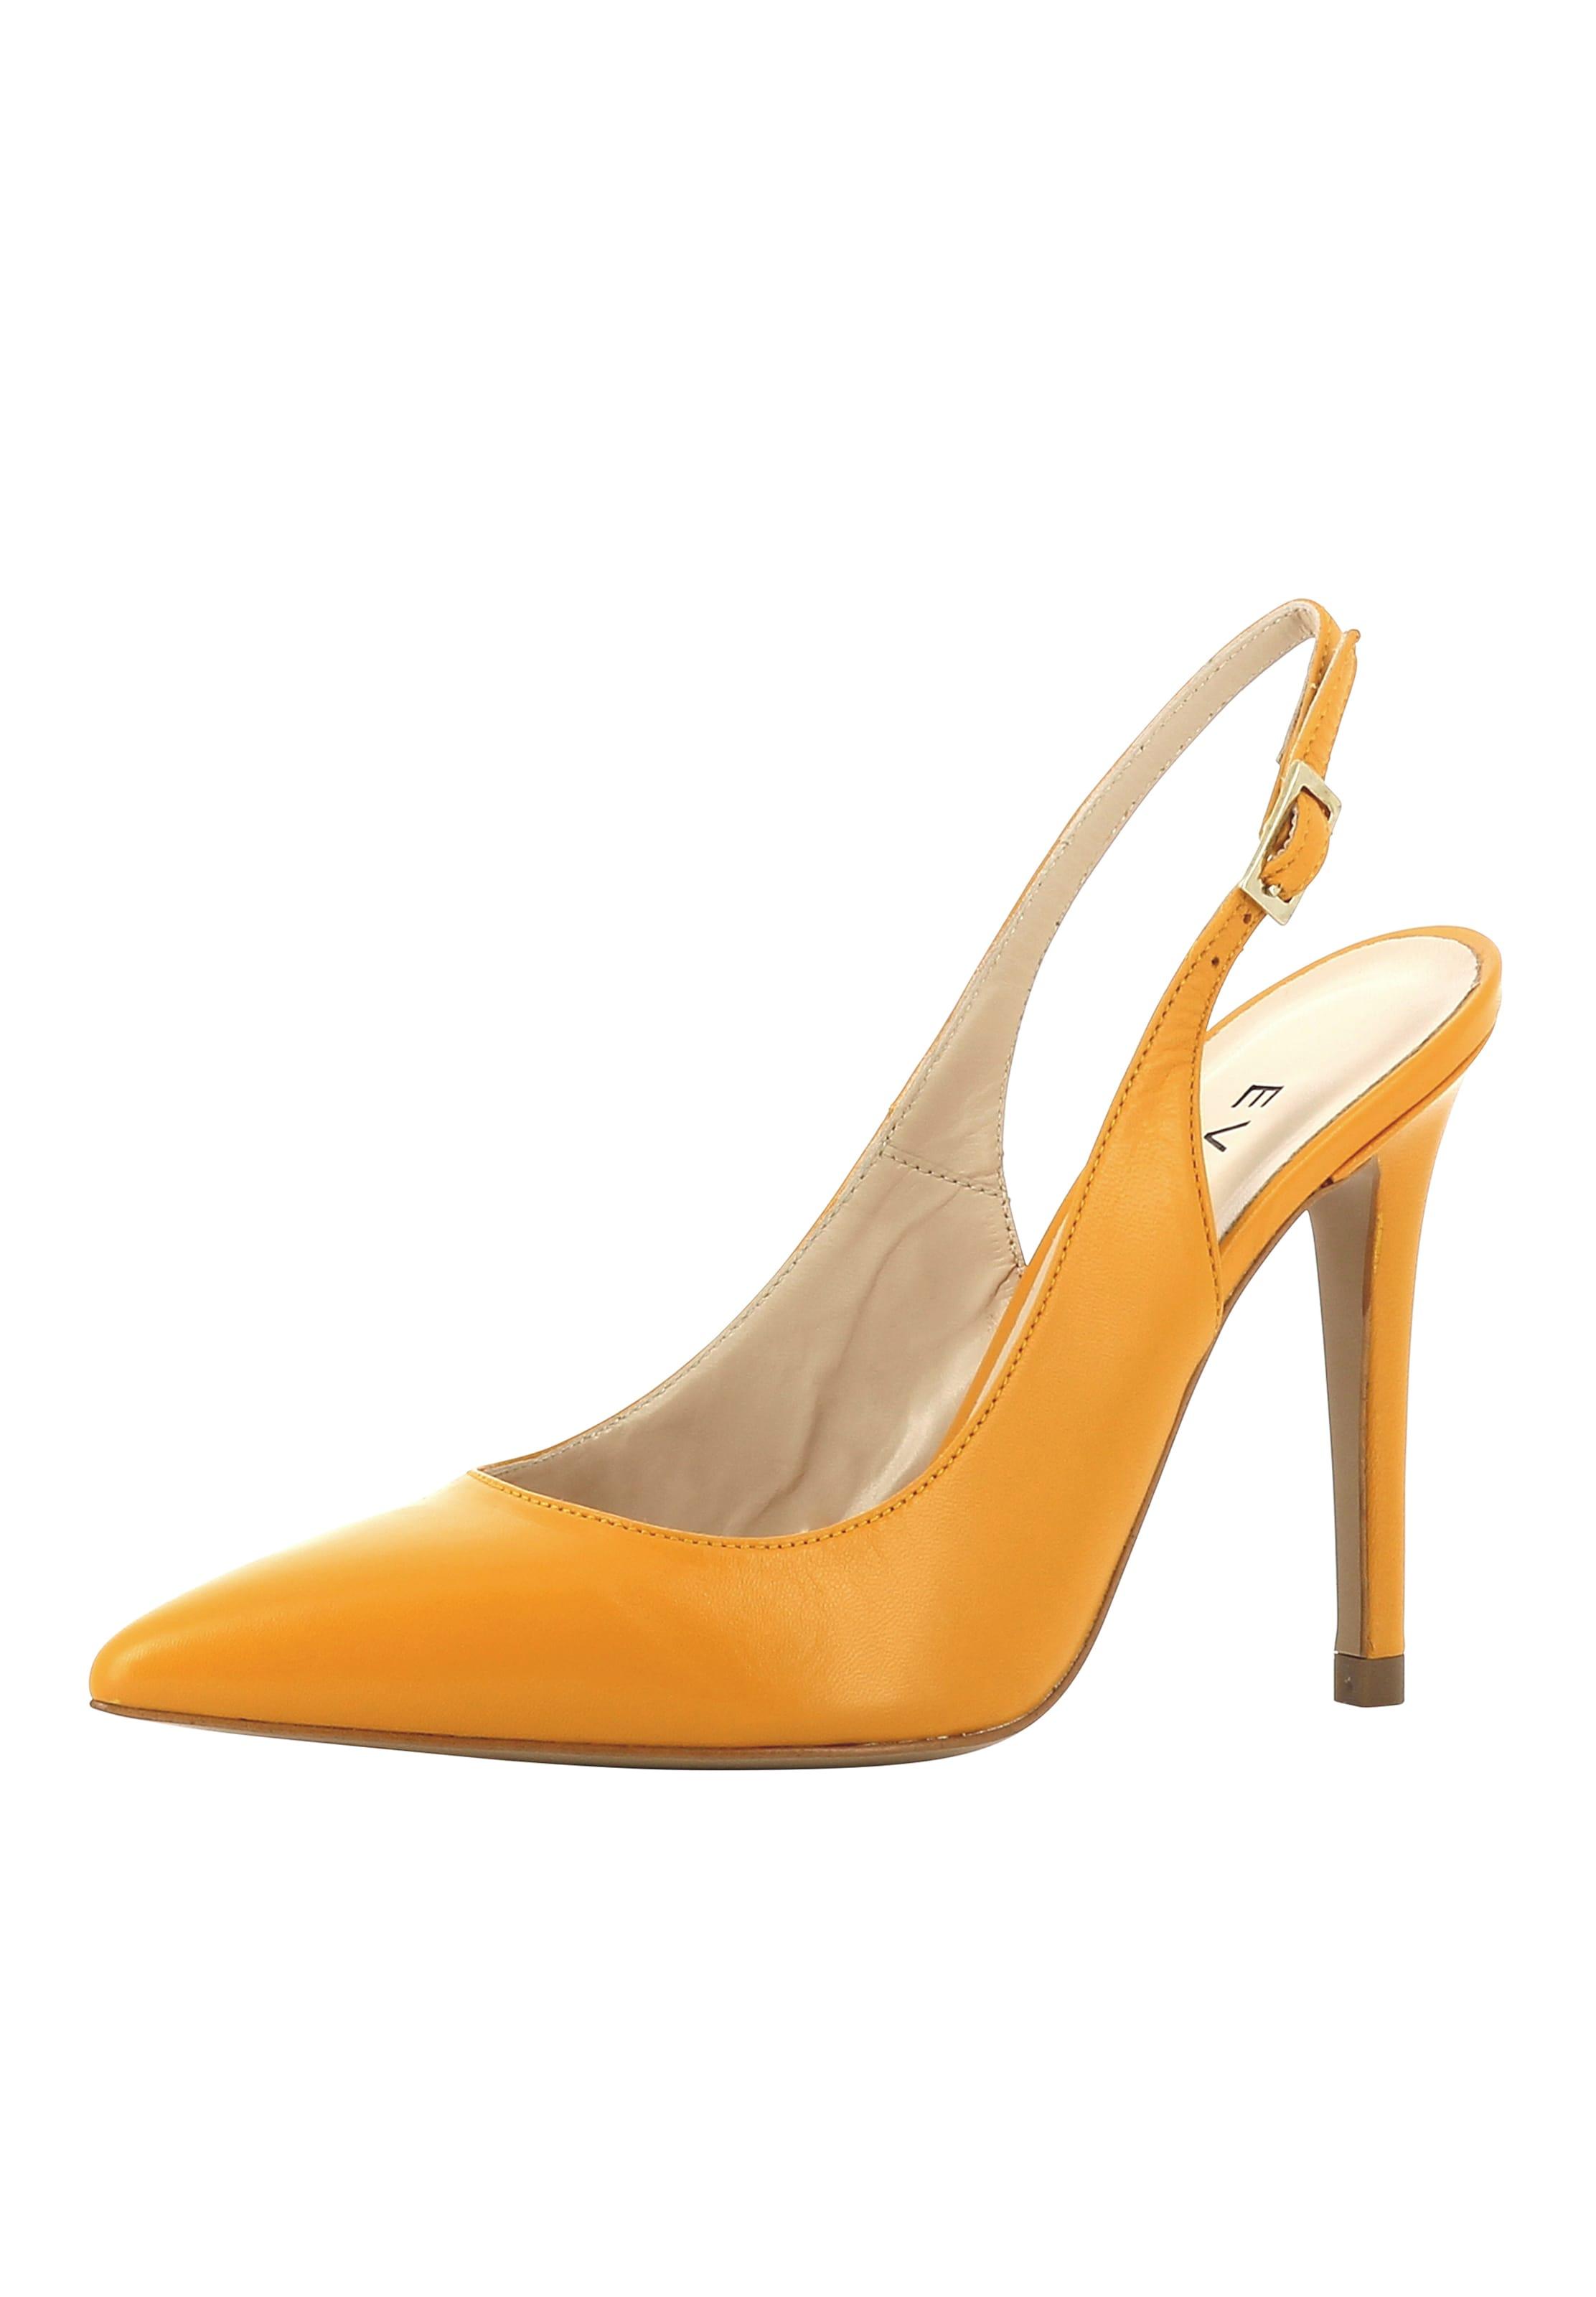 Evita In Sling Pumps Damen Orange 4cARjL35q